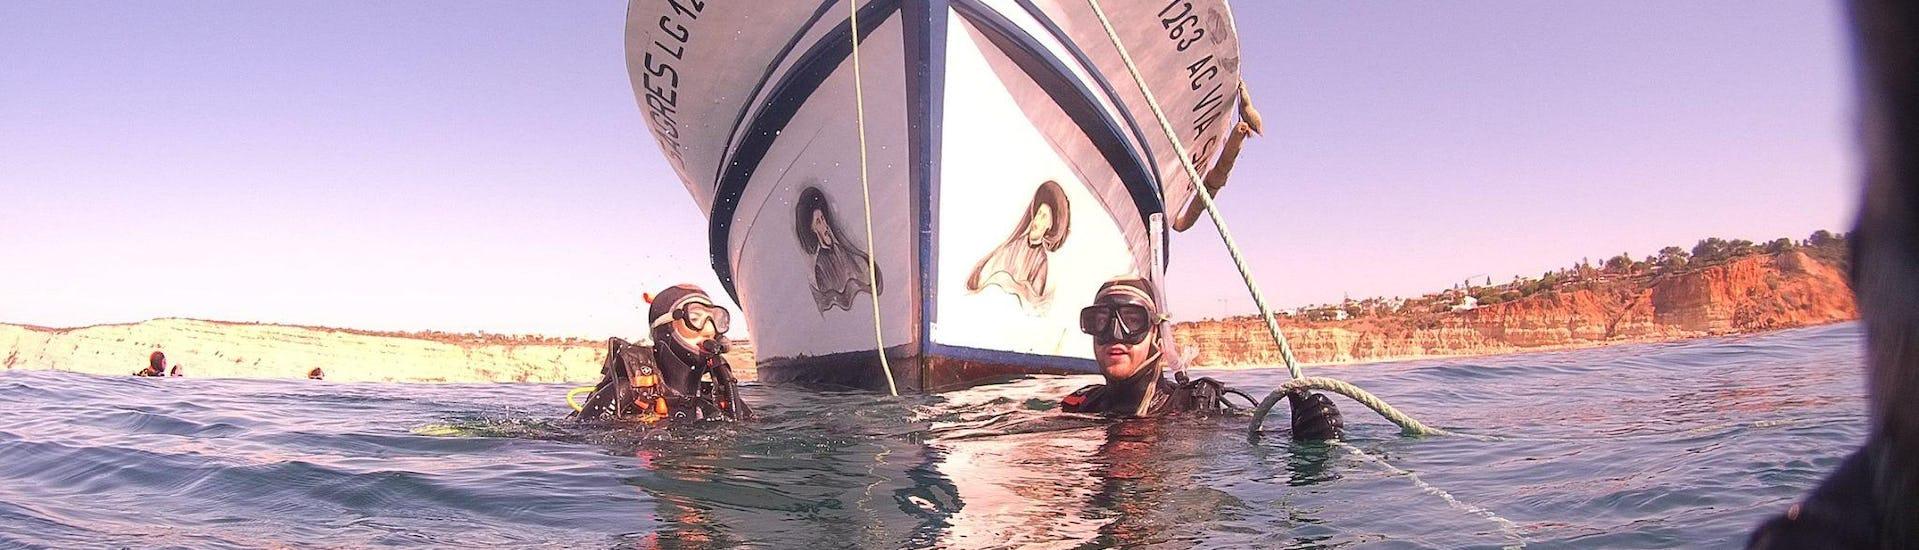 Scuba Diving Course - PADI Advanced Open Water Diver